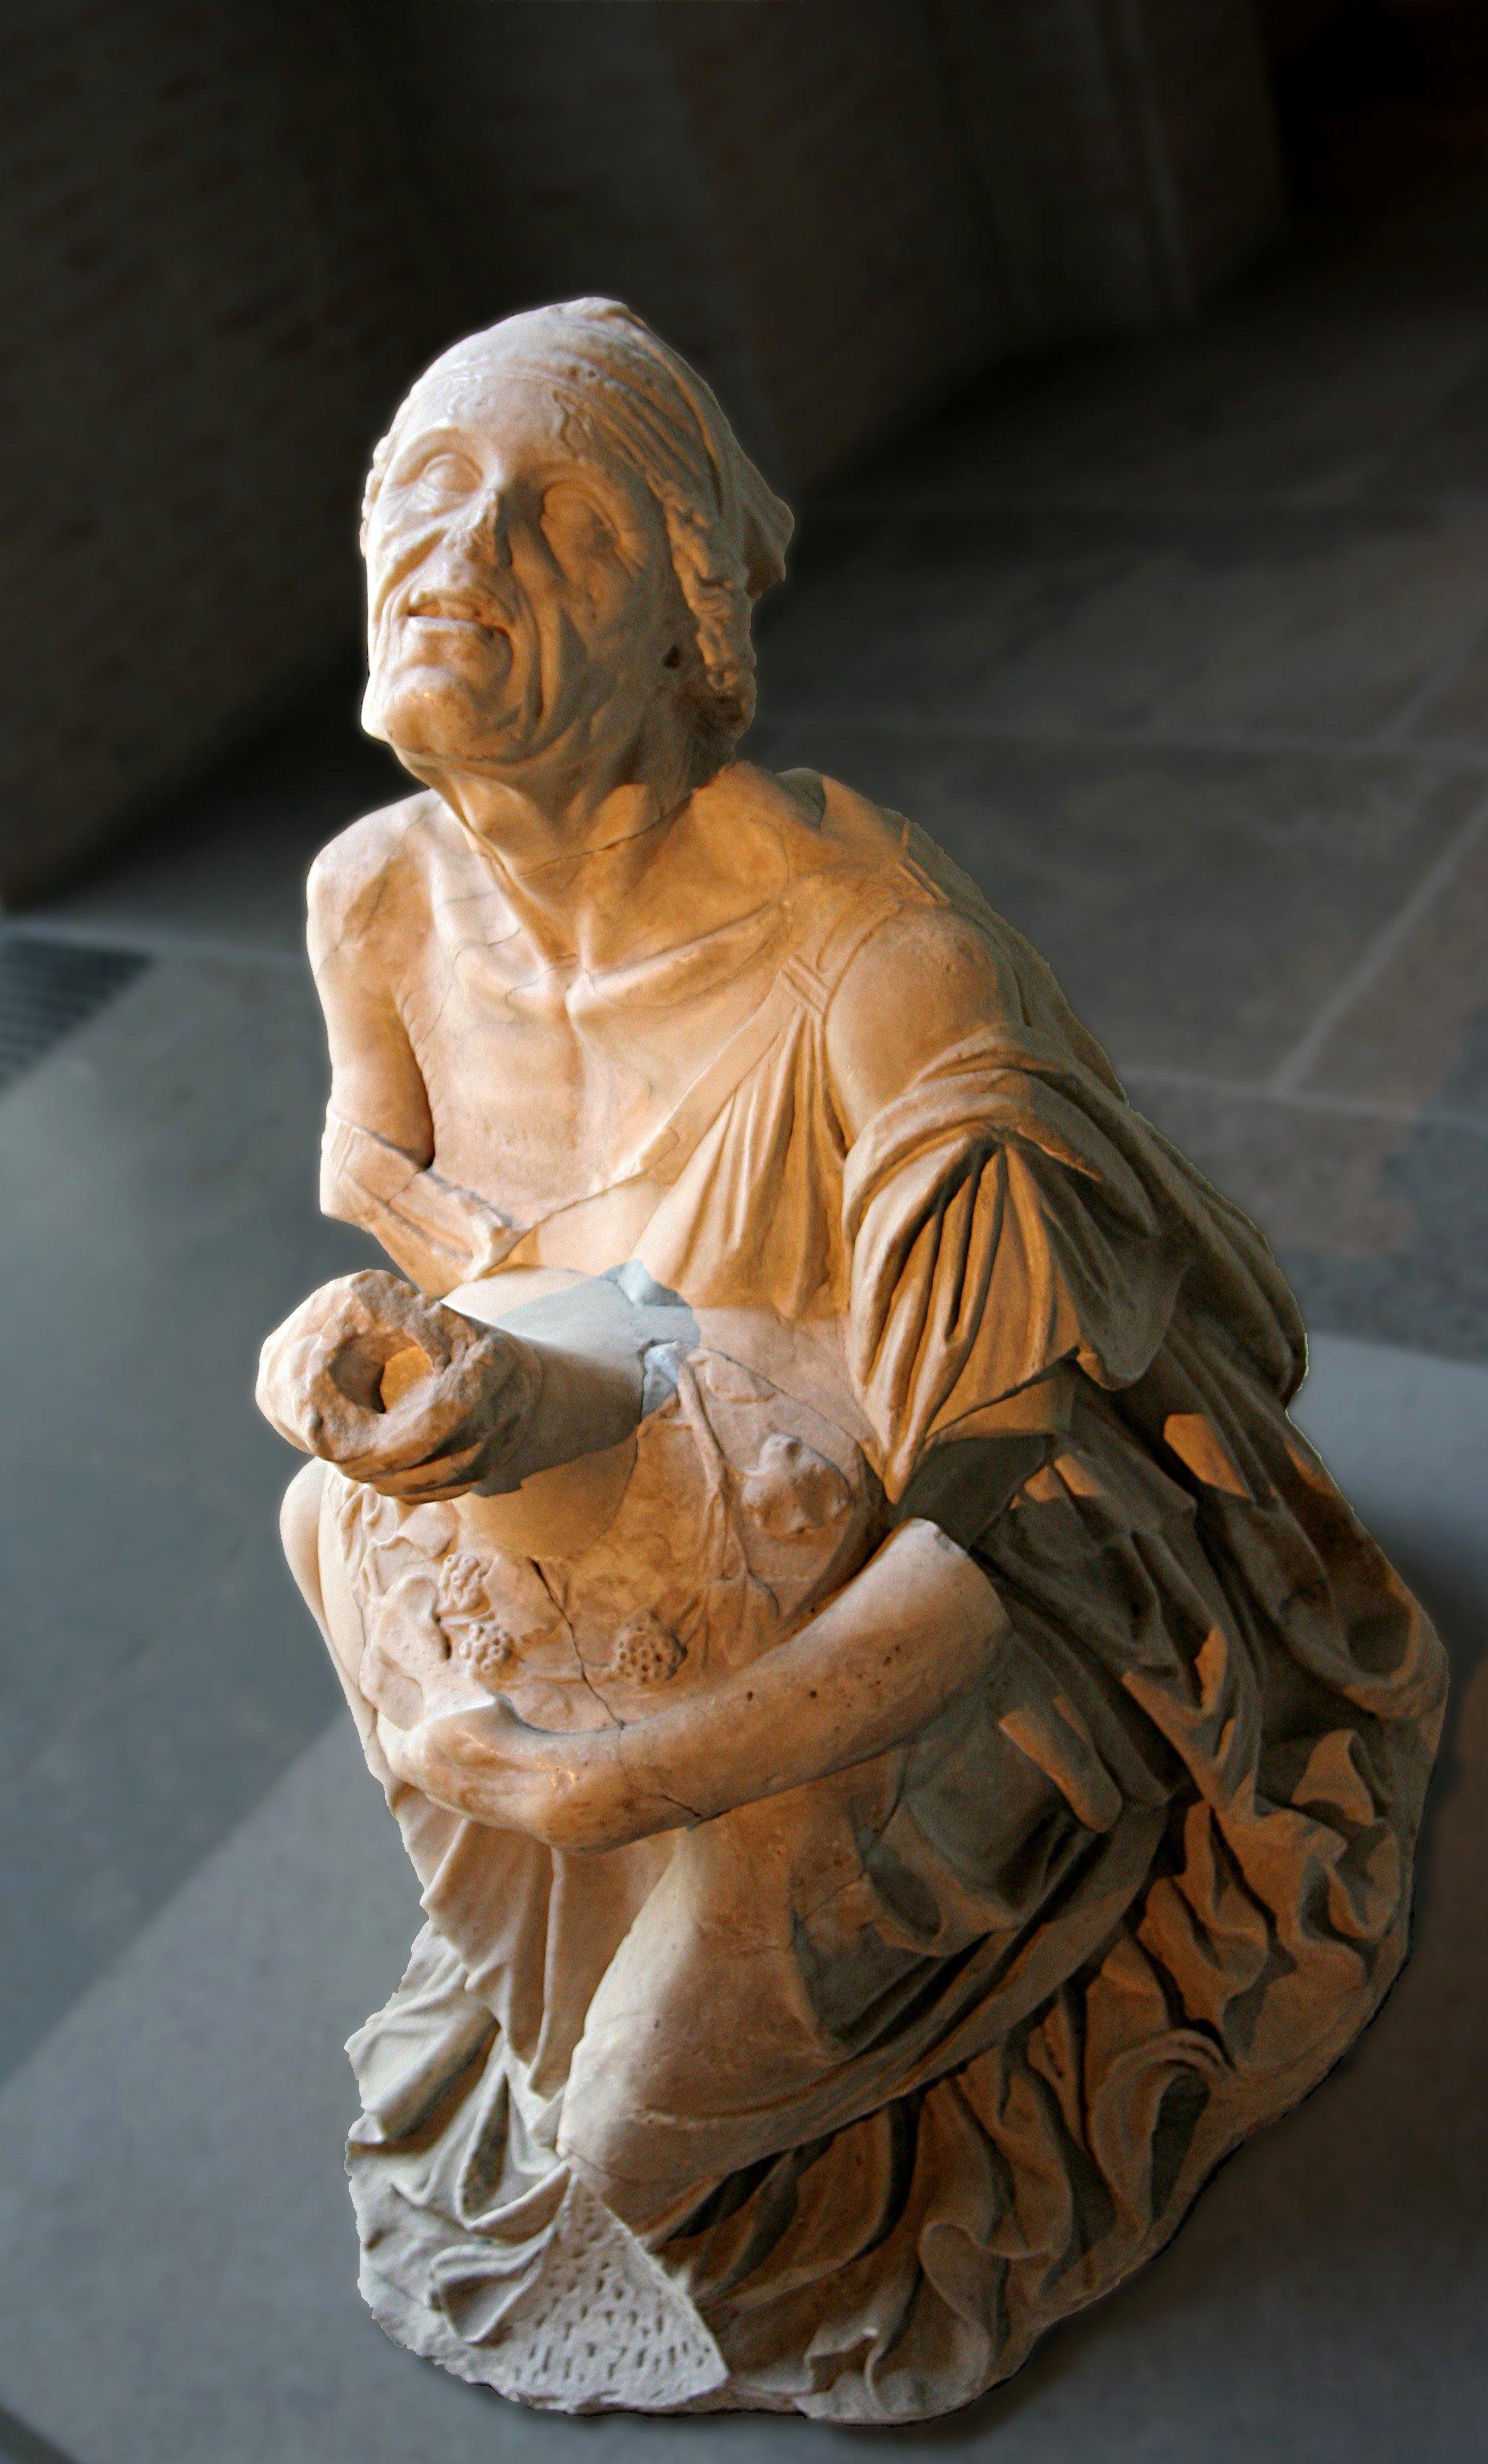 Old drunkard, Glyptothek Munich